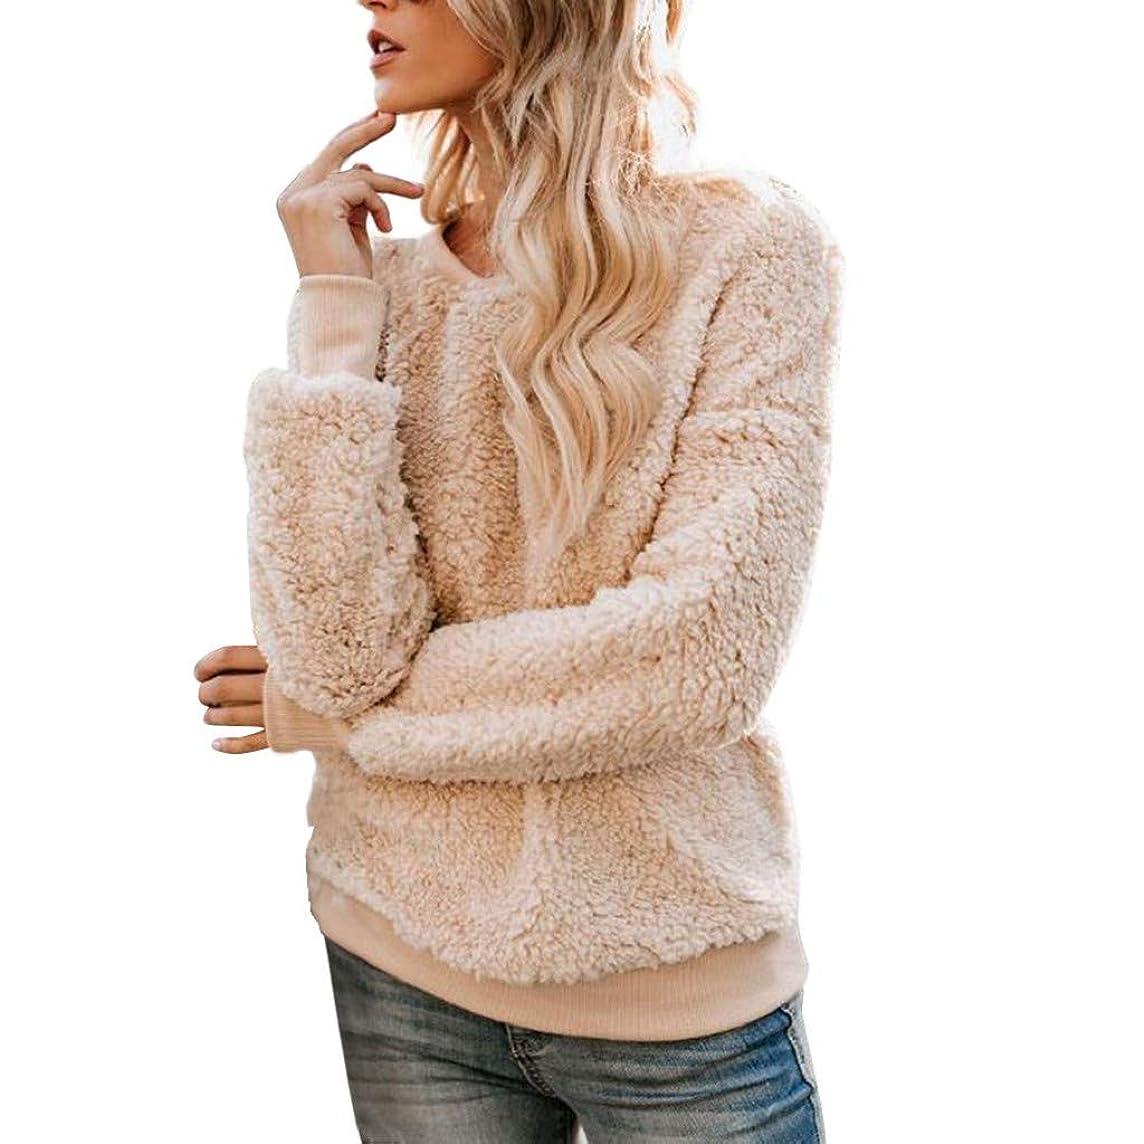 Creazrise Womens Fuzzy Sherpa Fleece Long Sleeve Sweaters Loose Crewn Pullovers Coat (Khaki,XL)